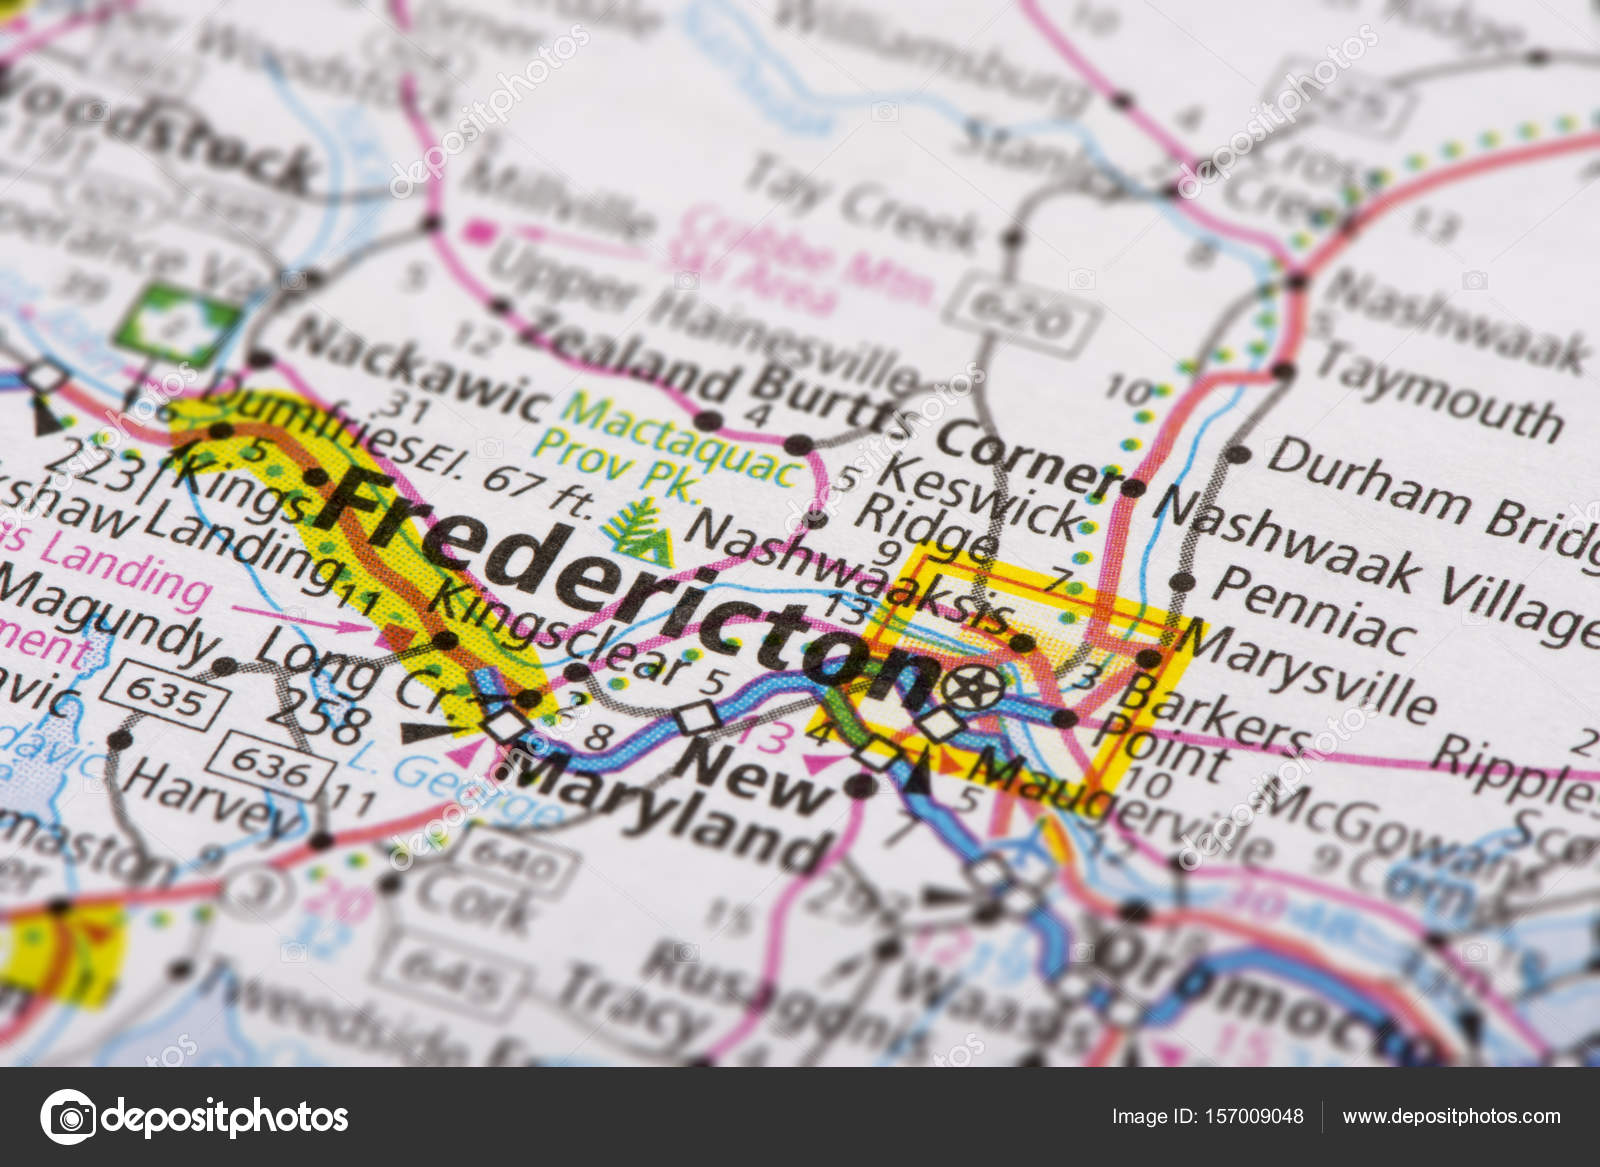 Fredericton, New Brunswick, Canada — Stock Photo © icemanj ... on ontario canada map, ottawa canada map, princeton canada map, chicago canada map, nunavut canada map, manitoba canada map, yellowknife canada map, oregon canada map, quebec canada map, new york state canada map, queen's university canada map, alberta canada map, maine map, amherst canada map, prince edward island canada map, saskatchewan canada map, new hampshire canada map, newfoundland canada map, yukon territory canada map, nova scotia map,